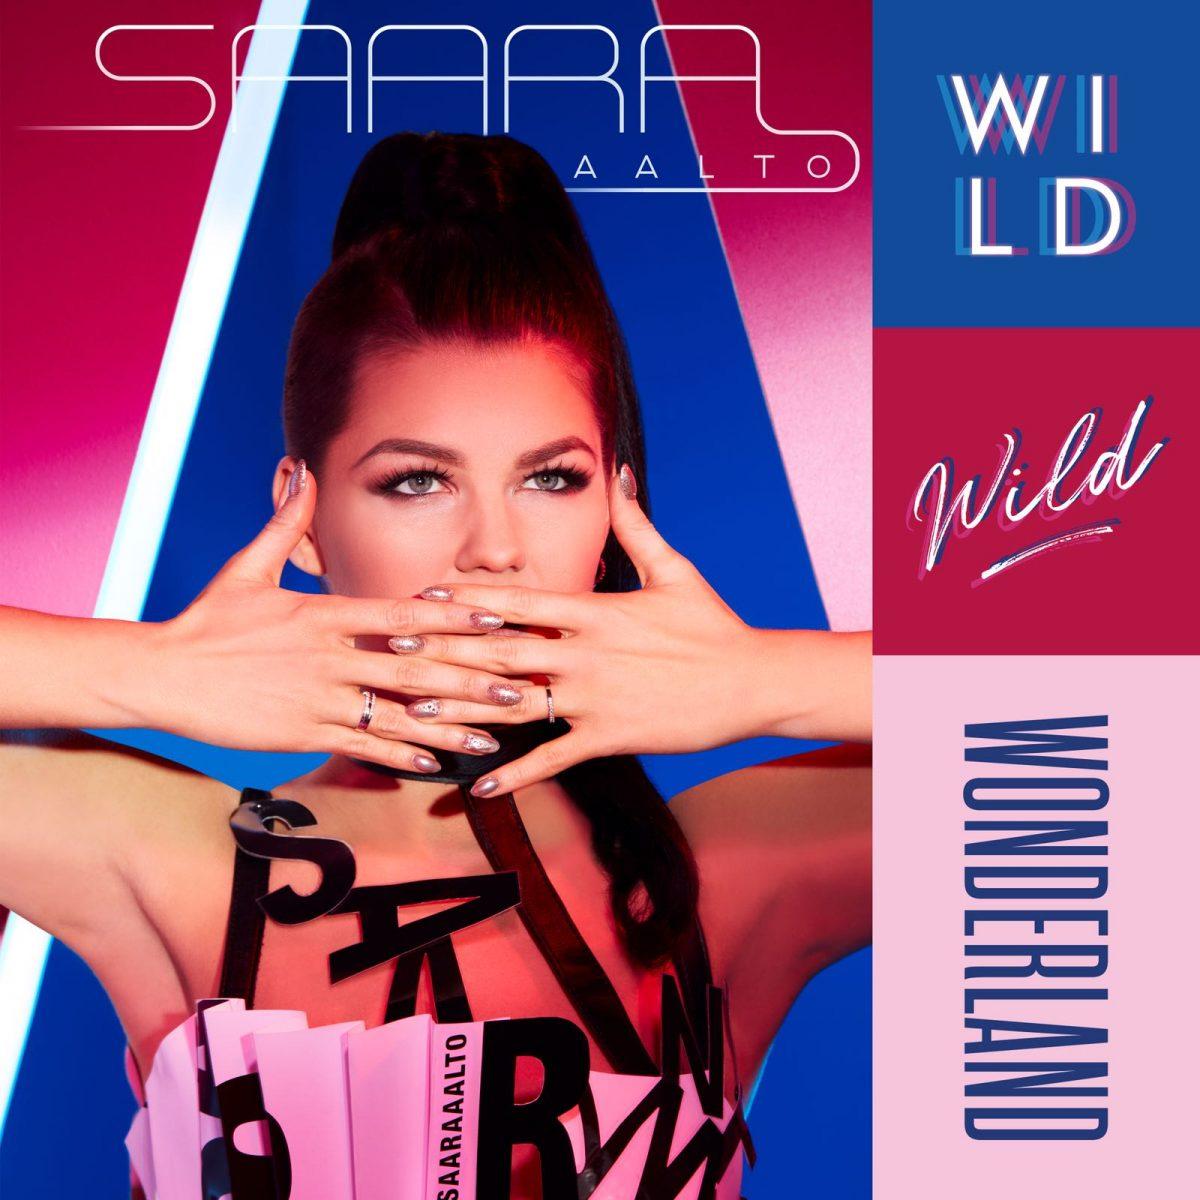 REVIEW: 'Wild Wild Wonderland' - Saara Aalto